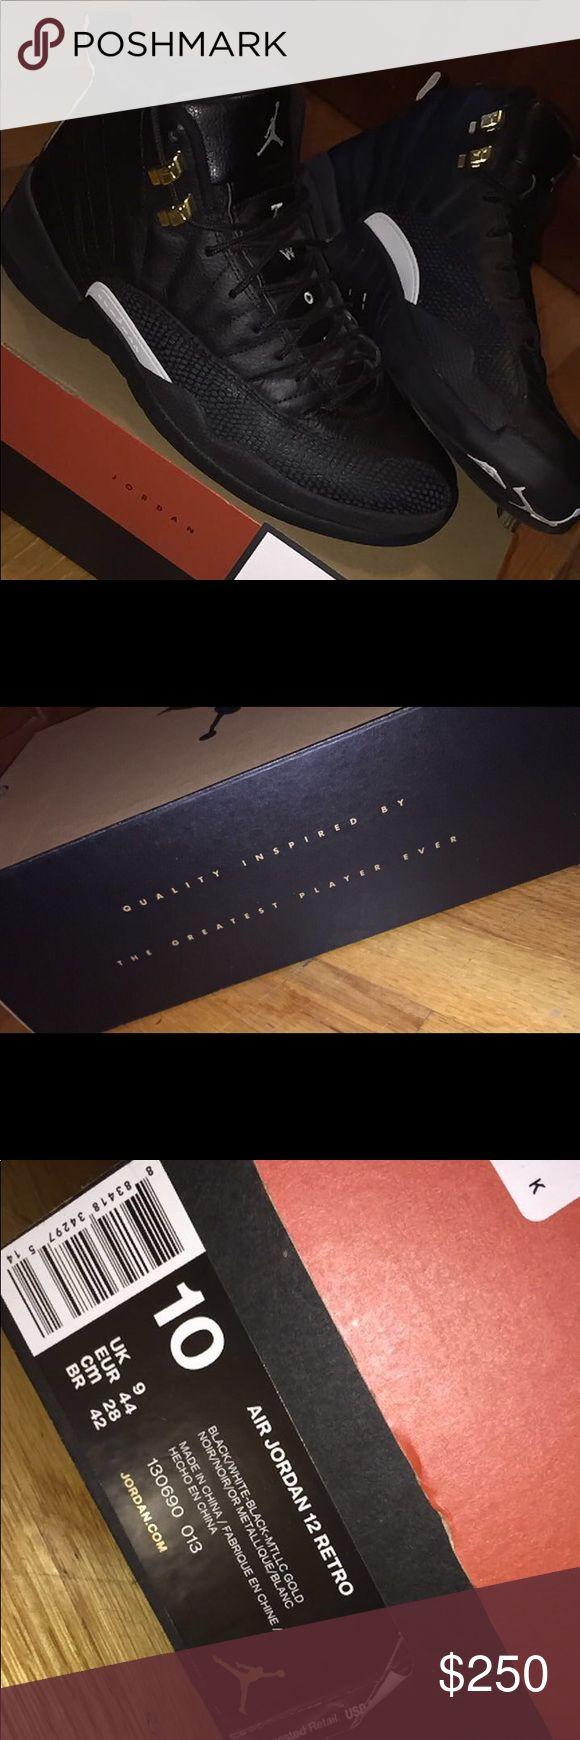 Air jordan master 12's Worn twice! Great condition, authentic. Rare Jordans Lowe price. Jordan Shoes Sneakers